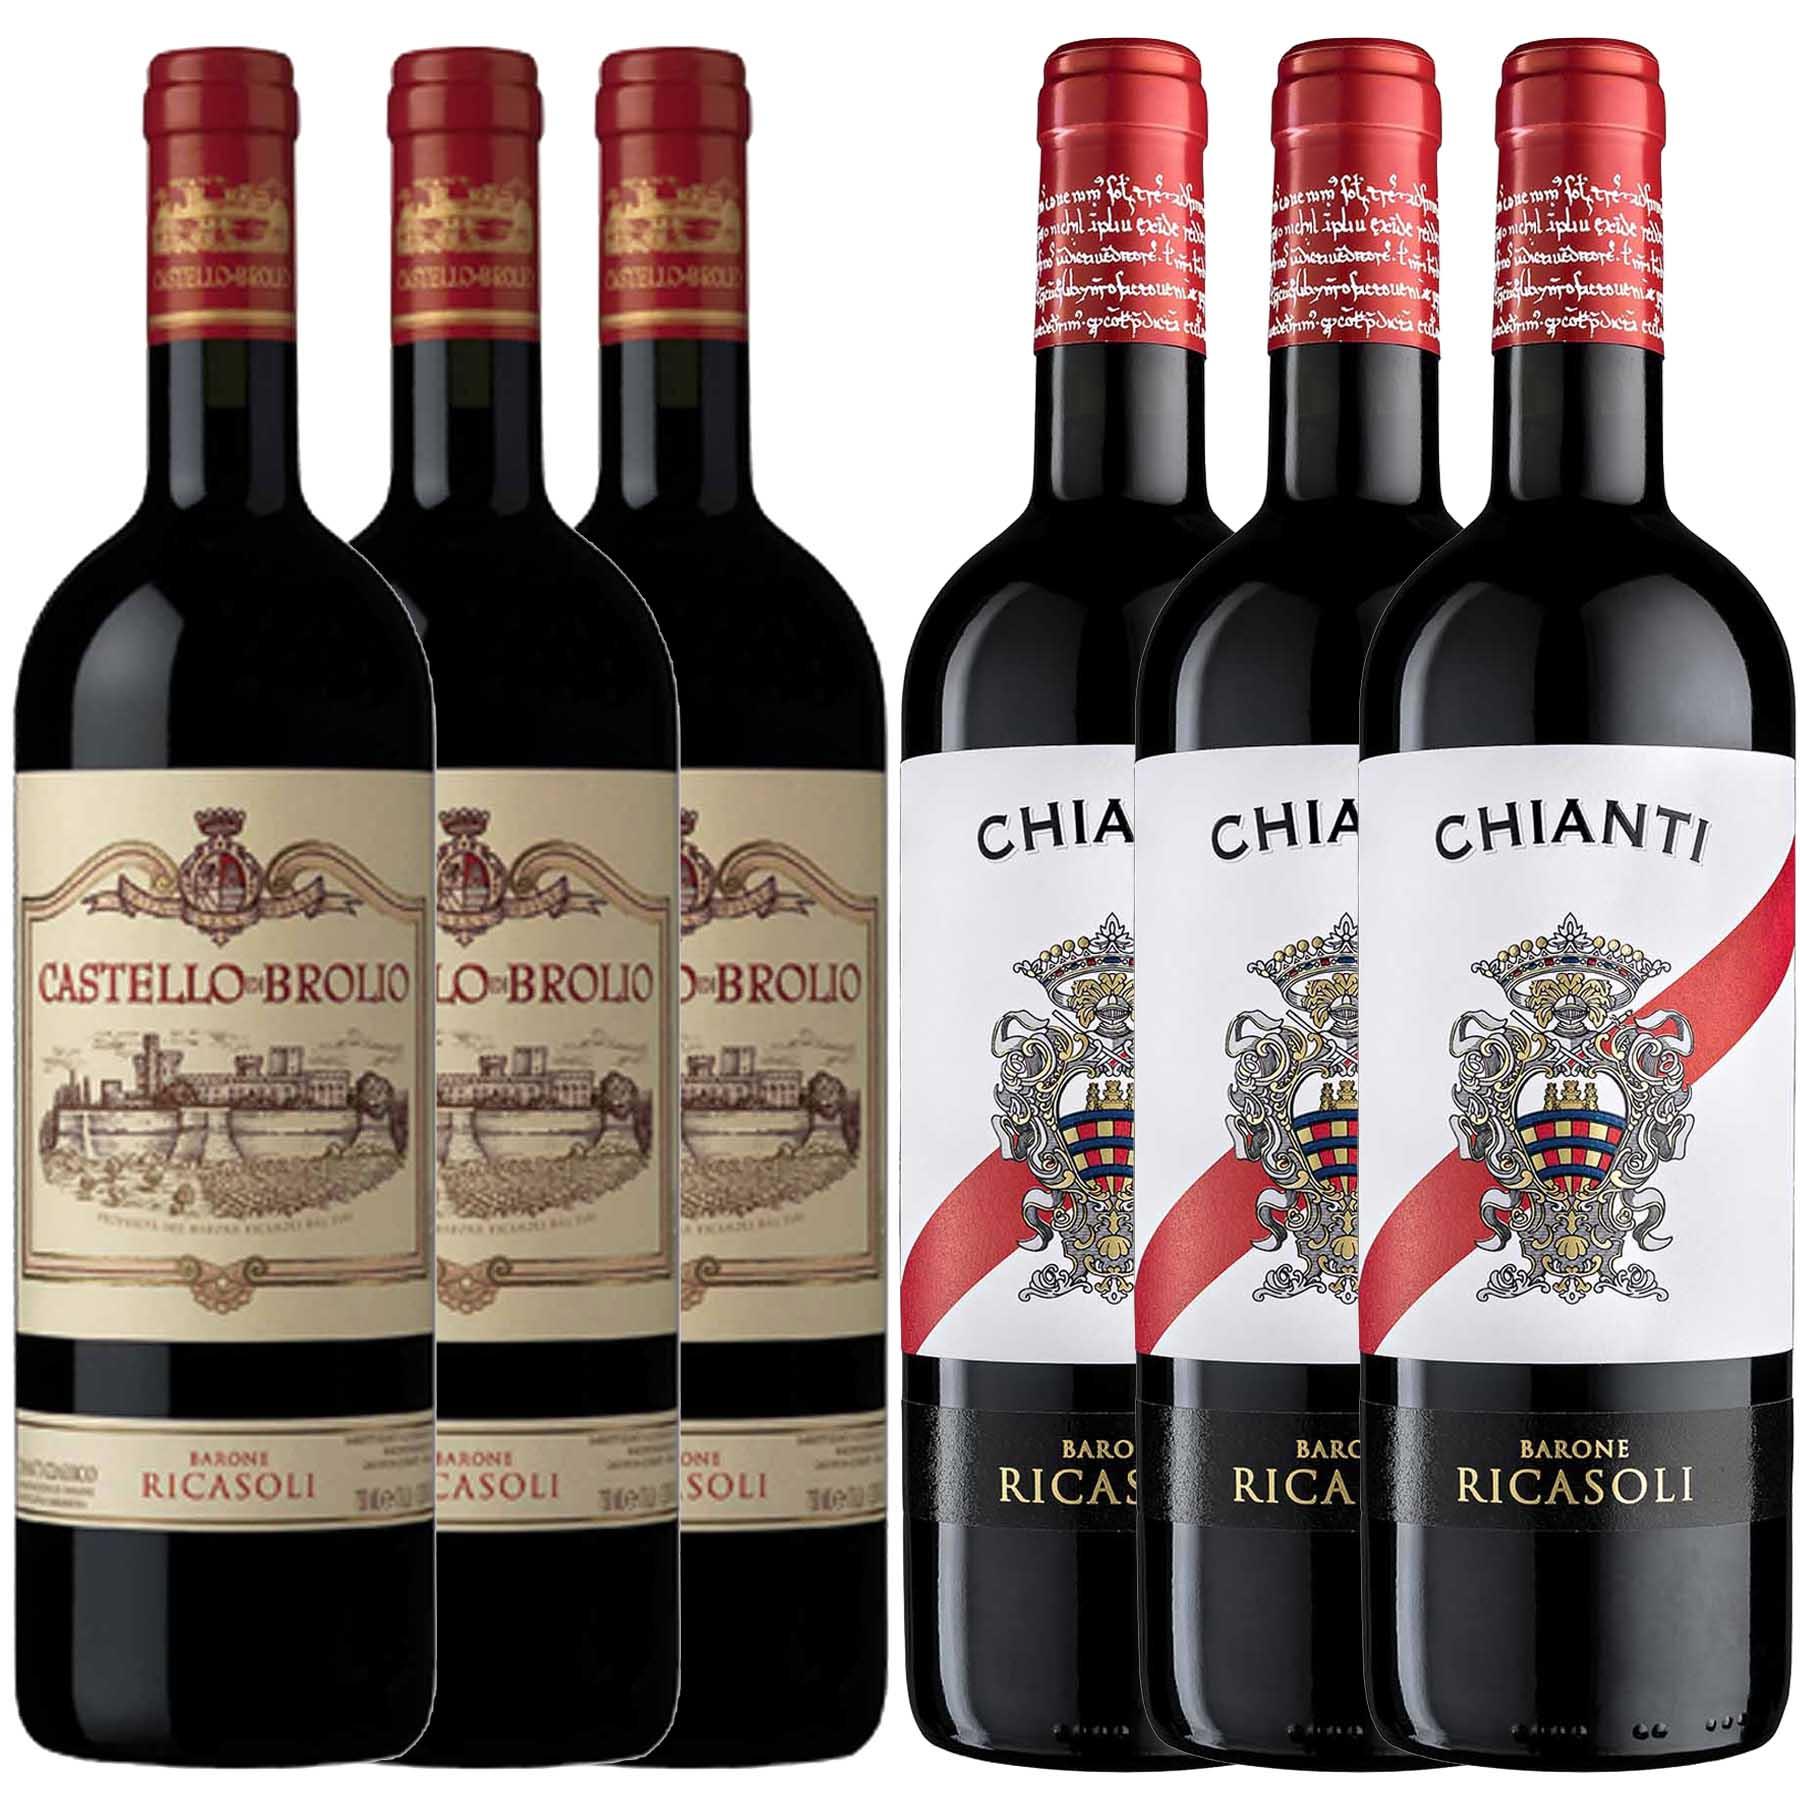 Kit Toscana 6 Vinho Chianti Ricasoli/Chianti Classico Brolio